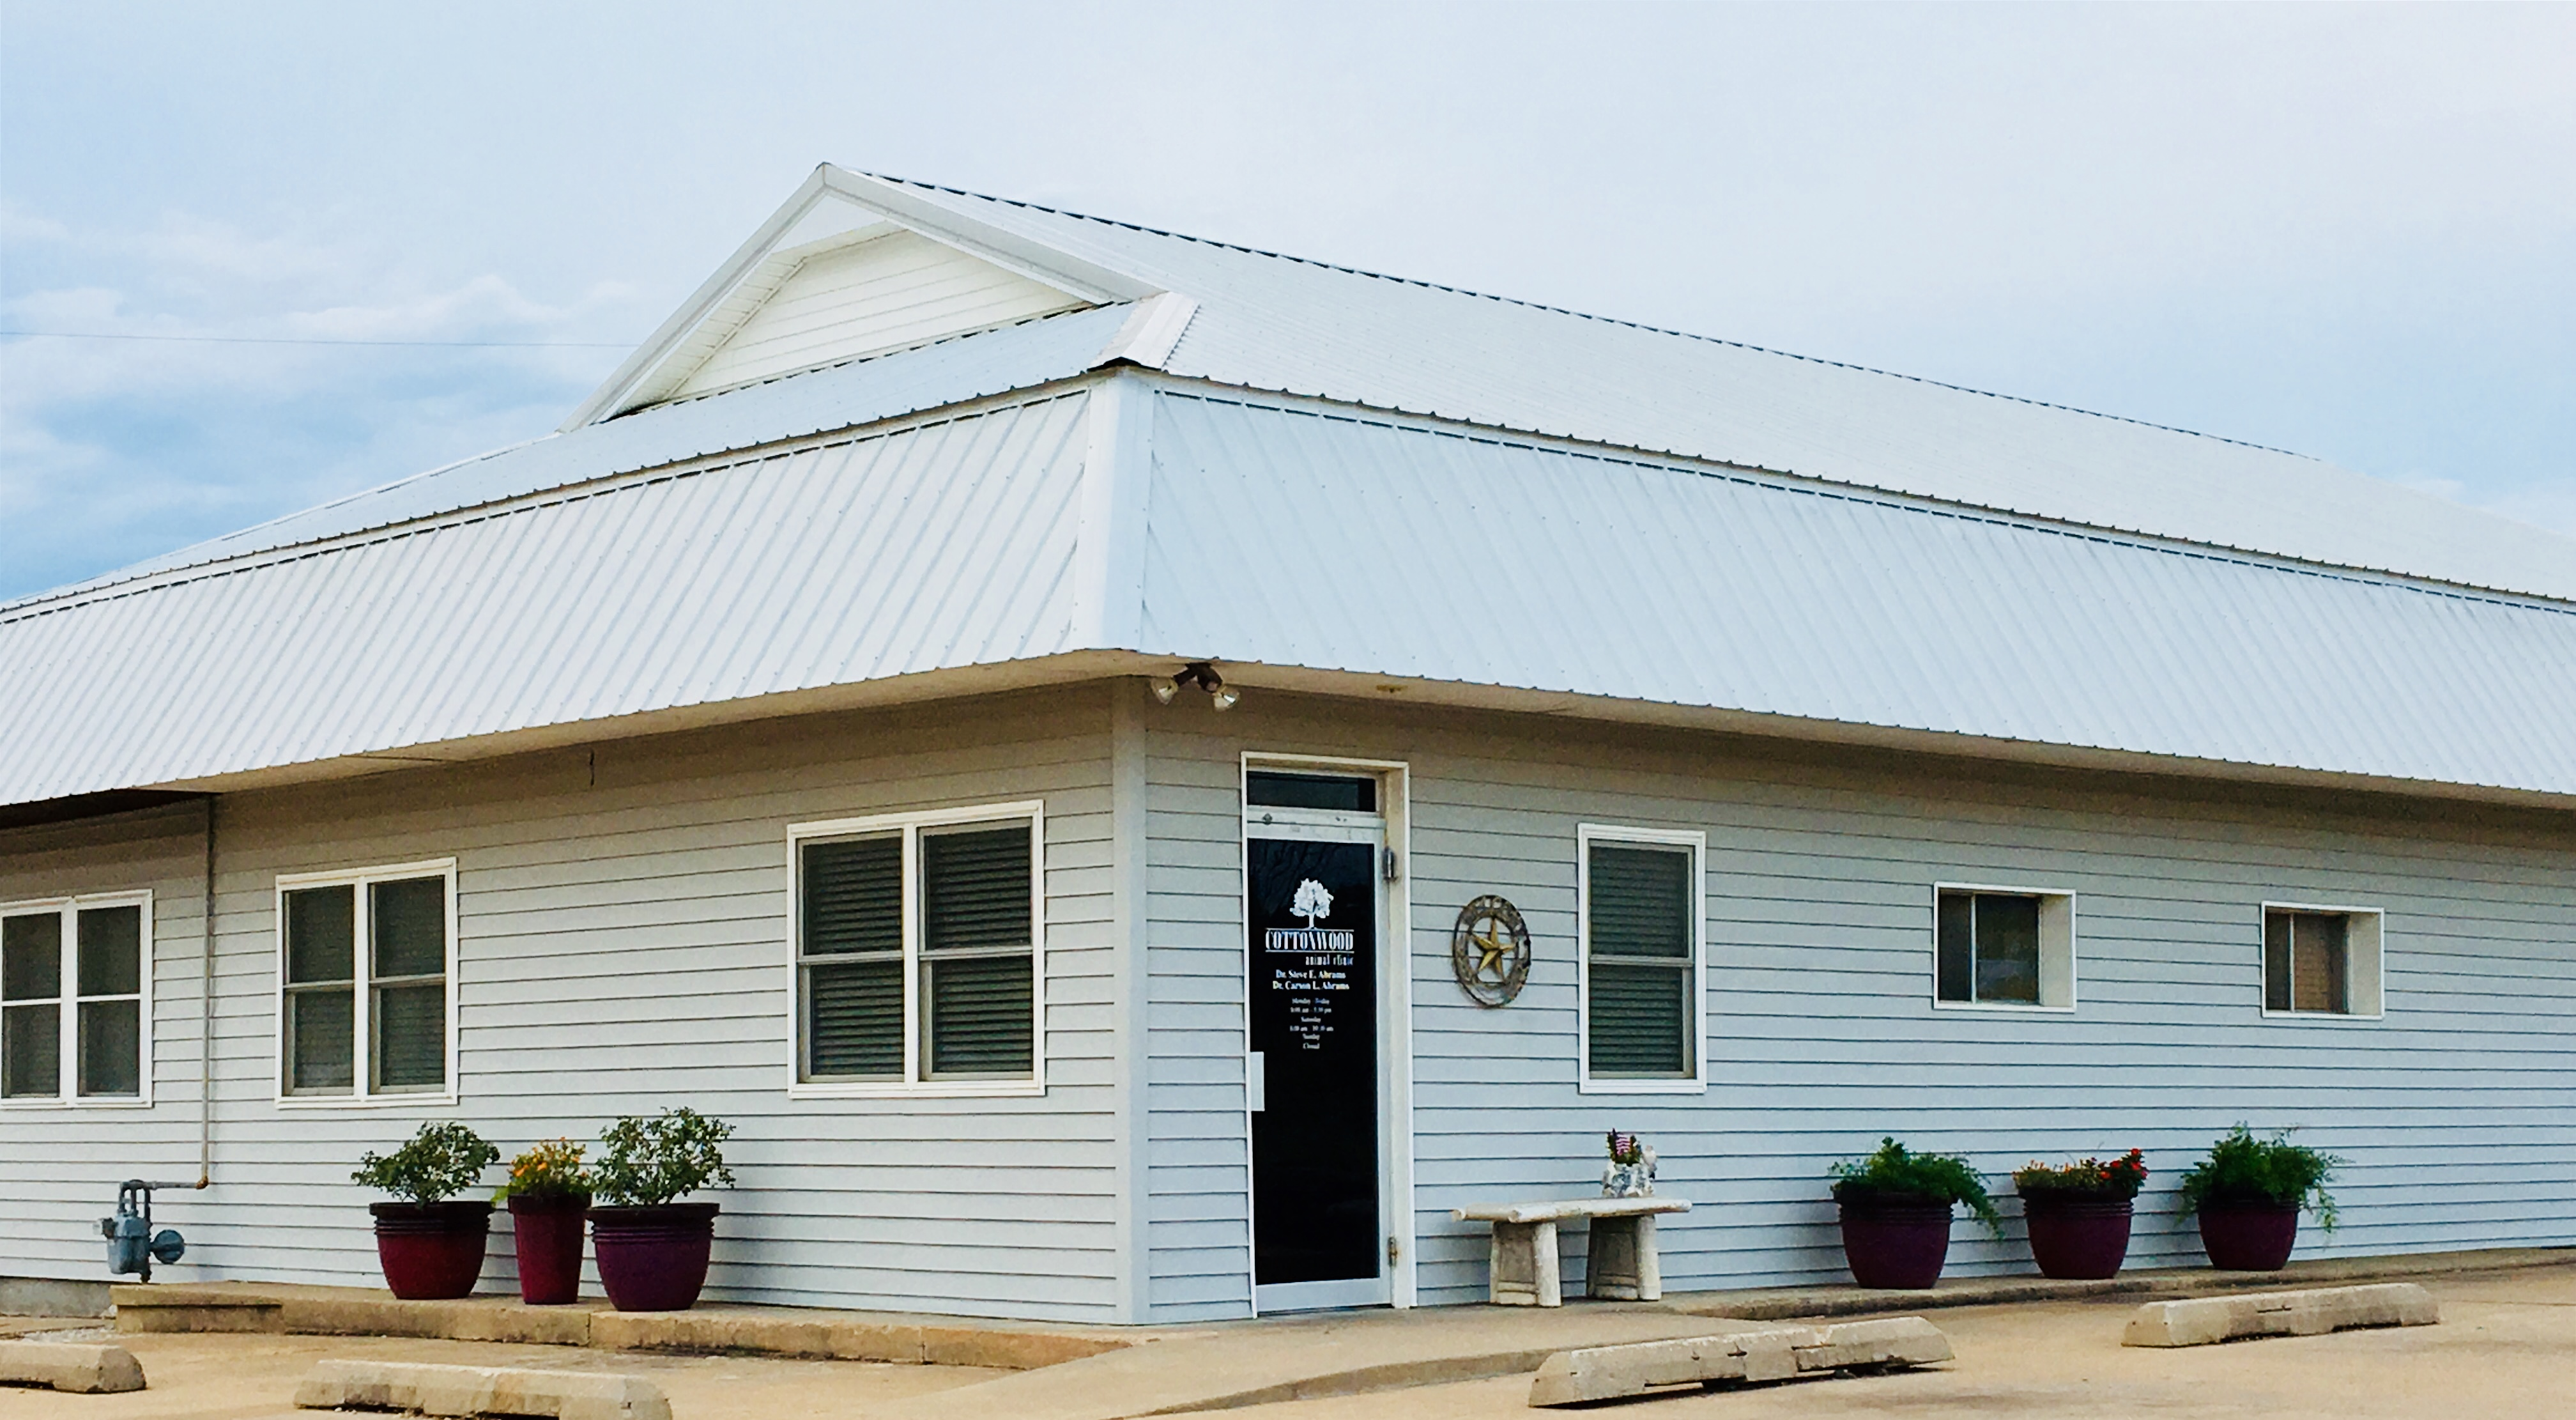 Cottonwood Animal Clinic